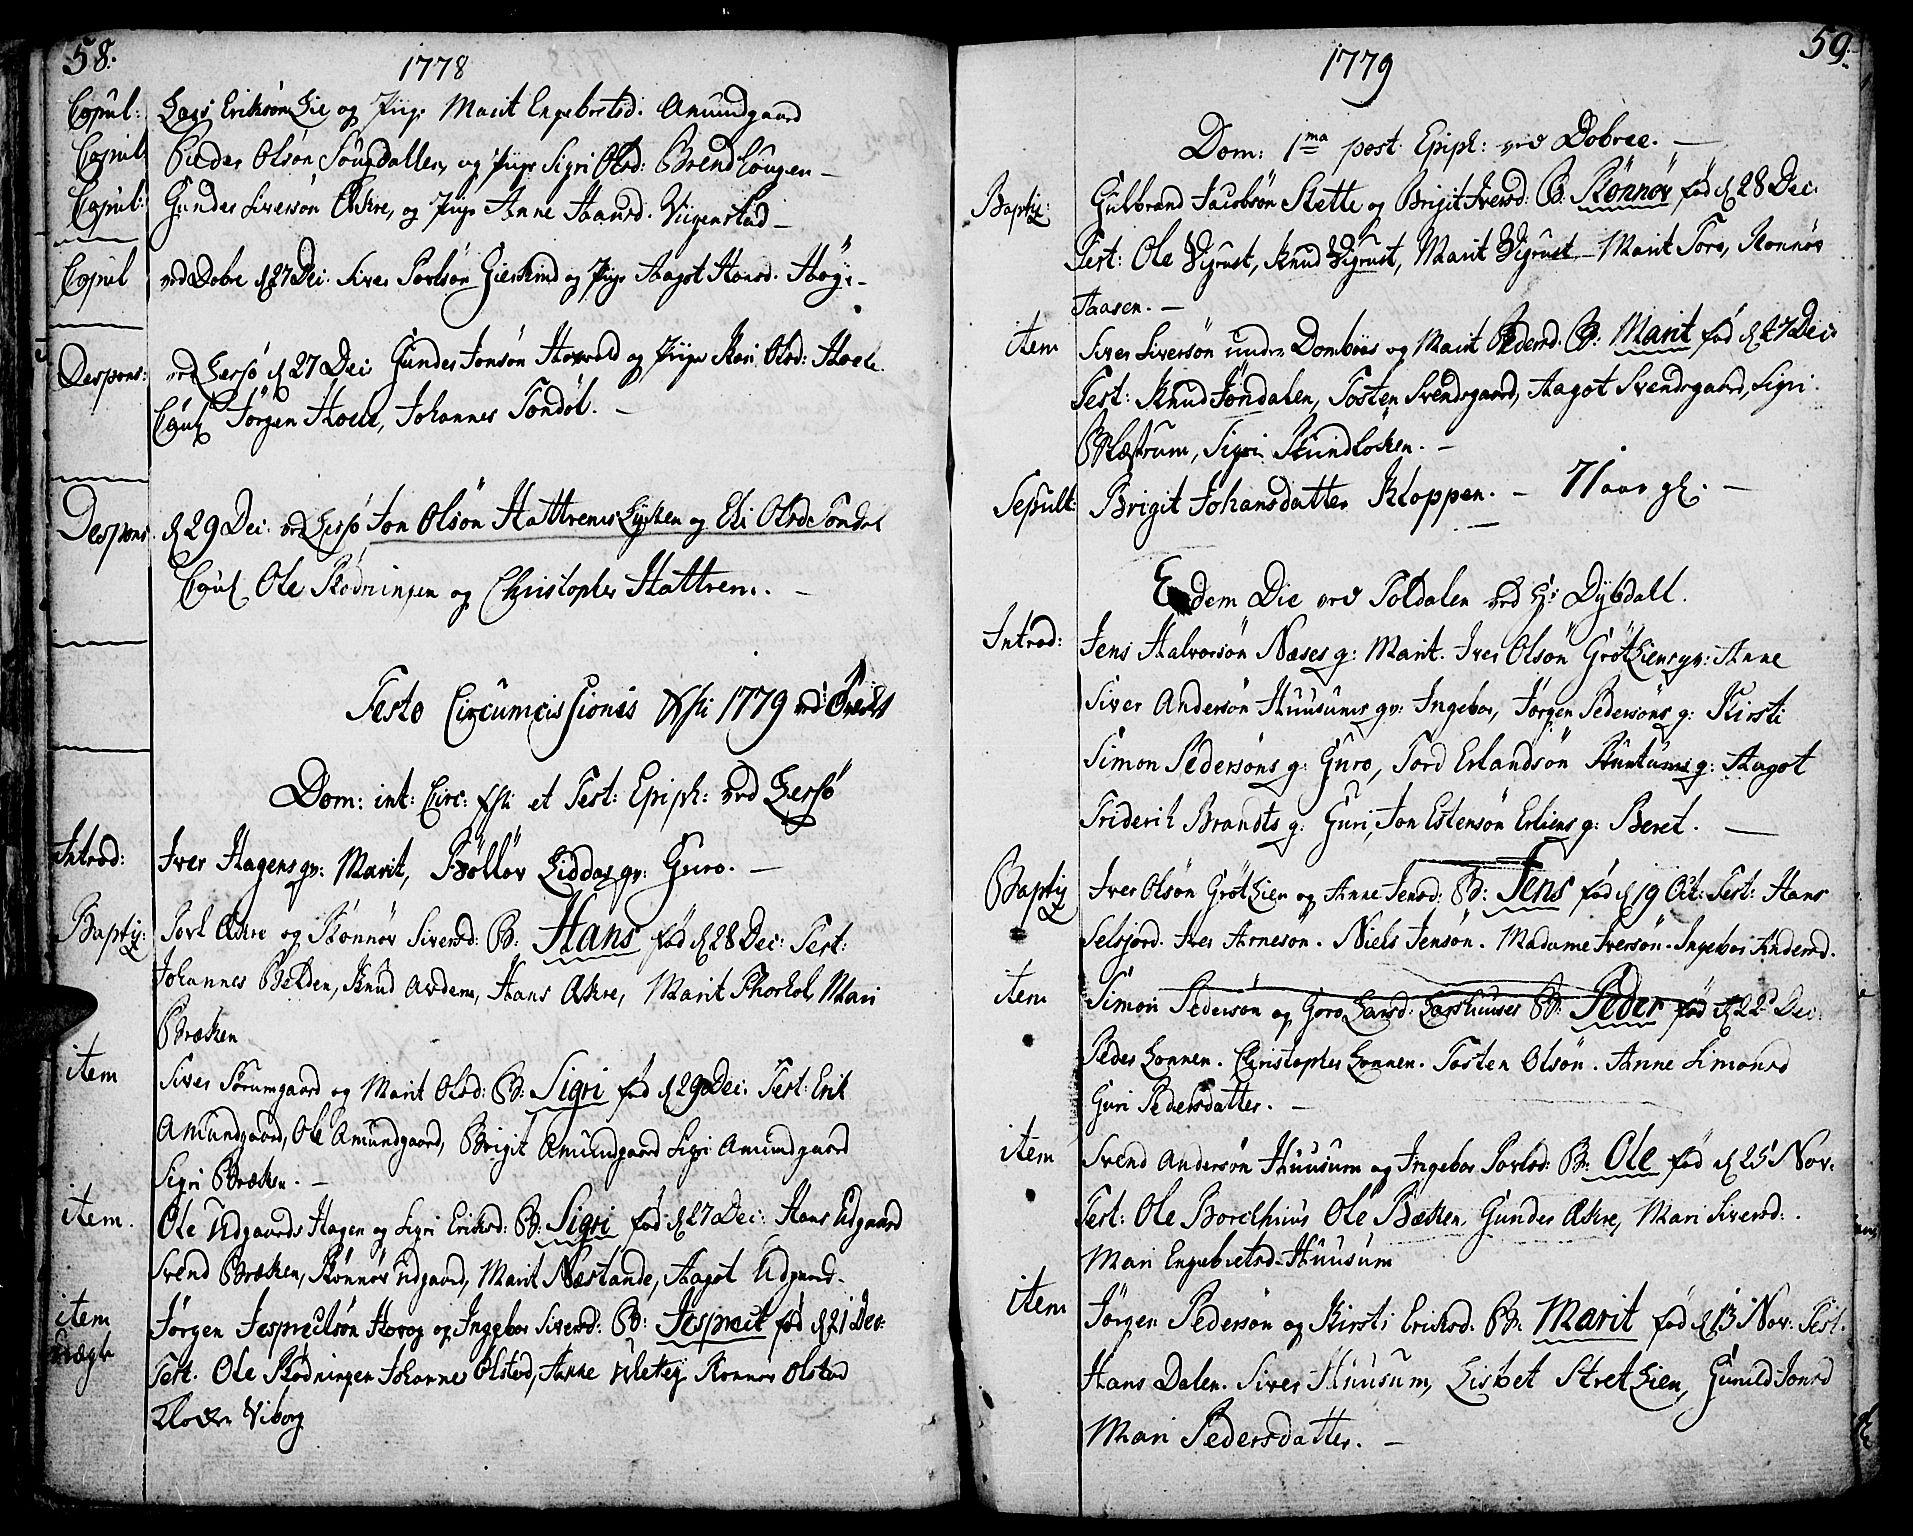 SAH, Lesja prestekontor, Ministerialbok nr. 3, 1777-1819, s. 58-59